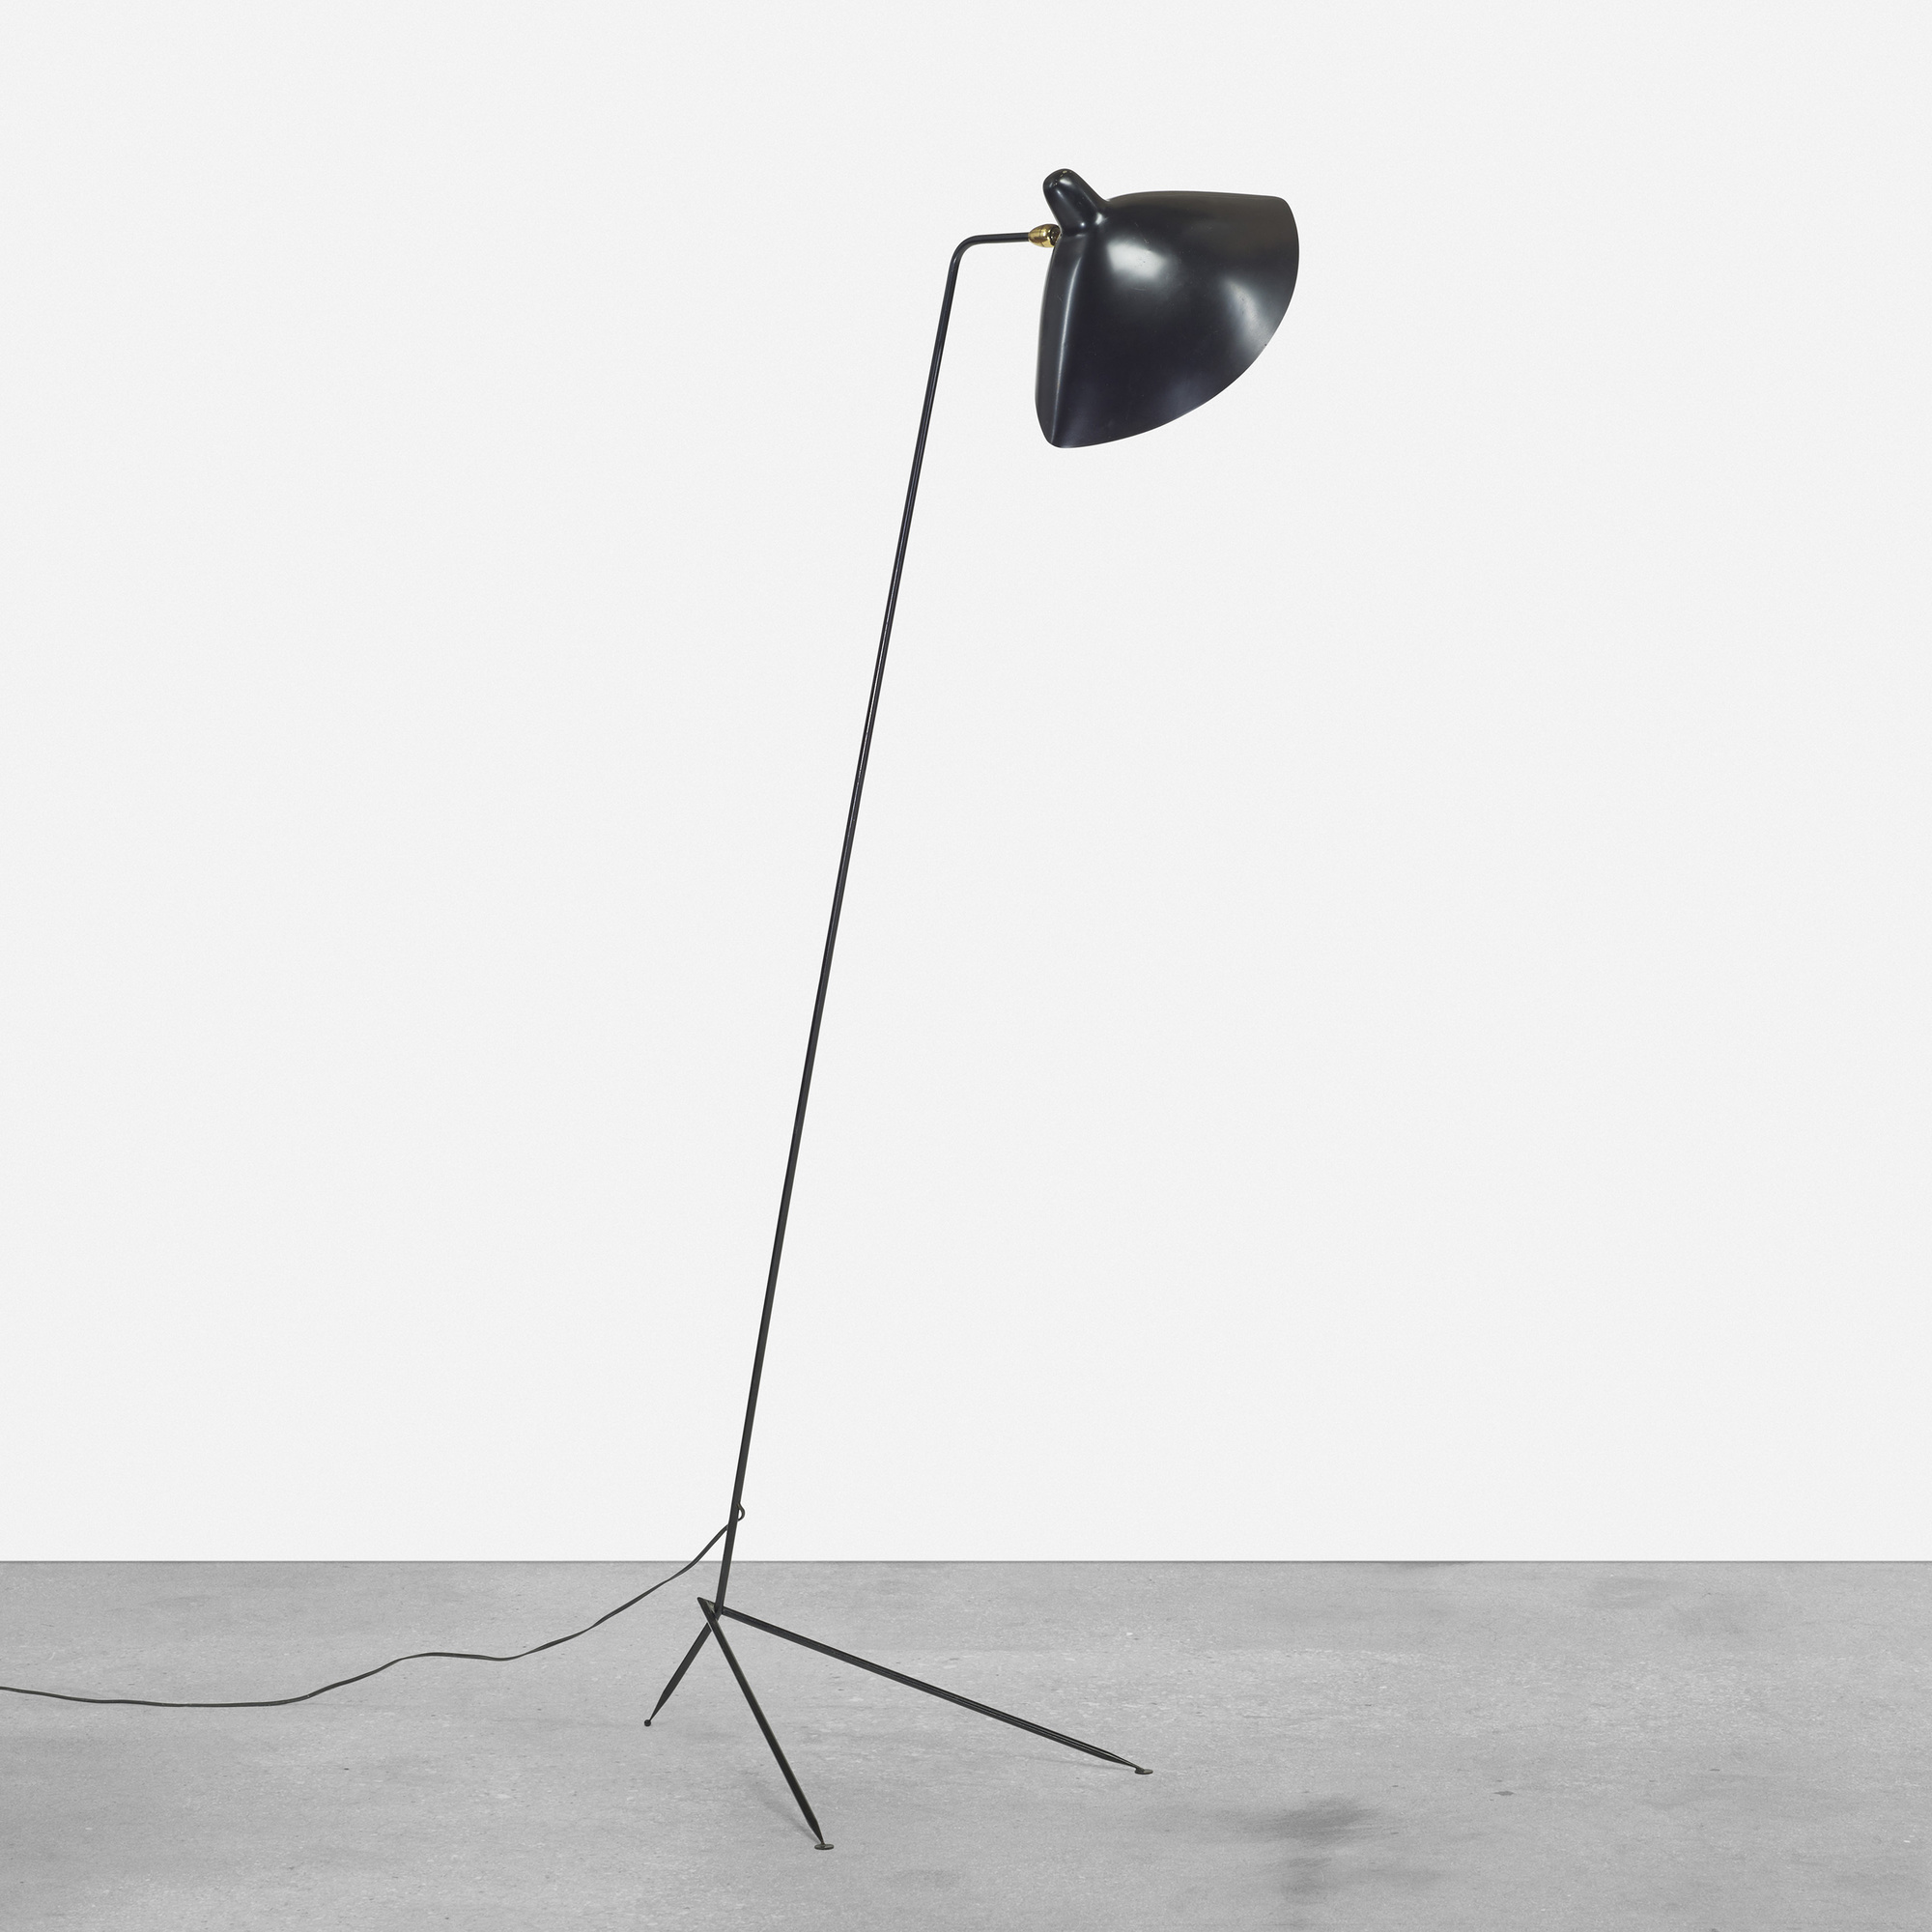 108: Serge Mouille / floor lamp < Design, 10 December 2015 ...